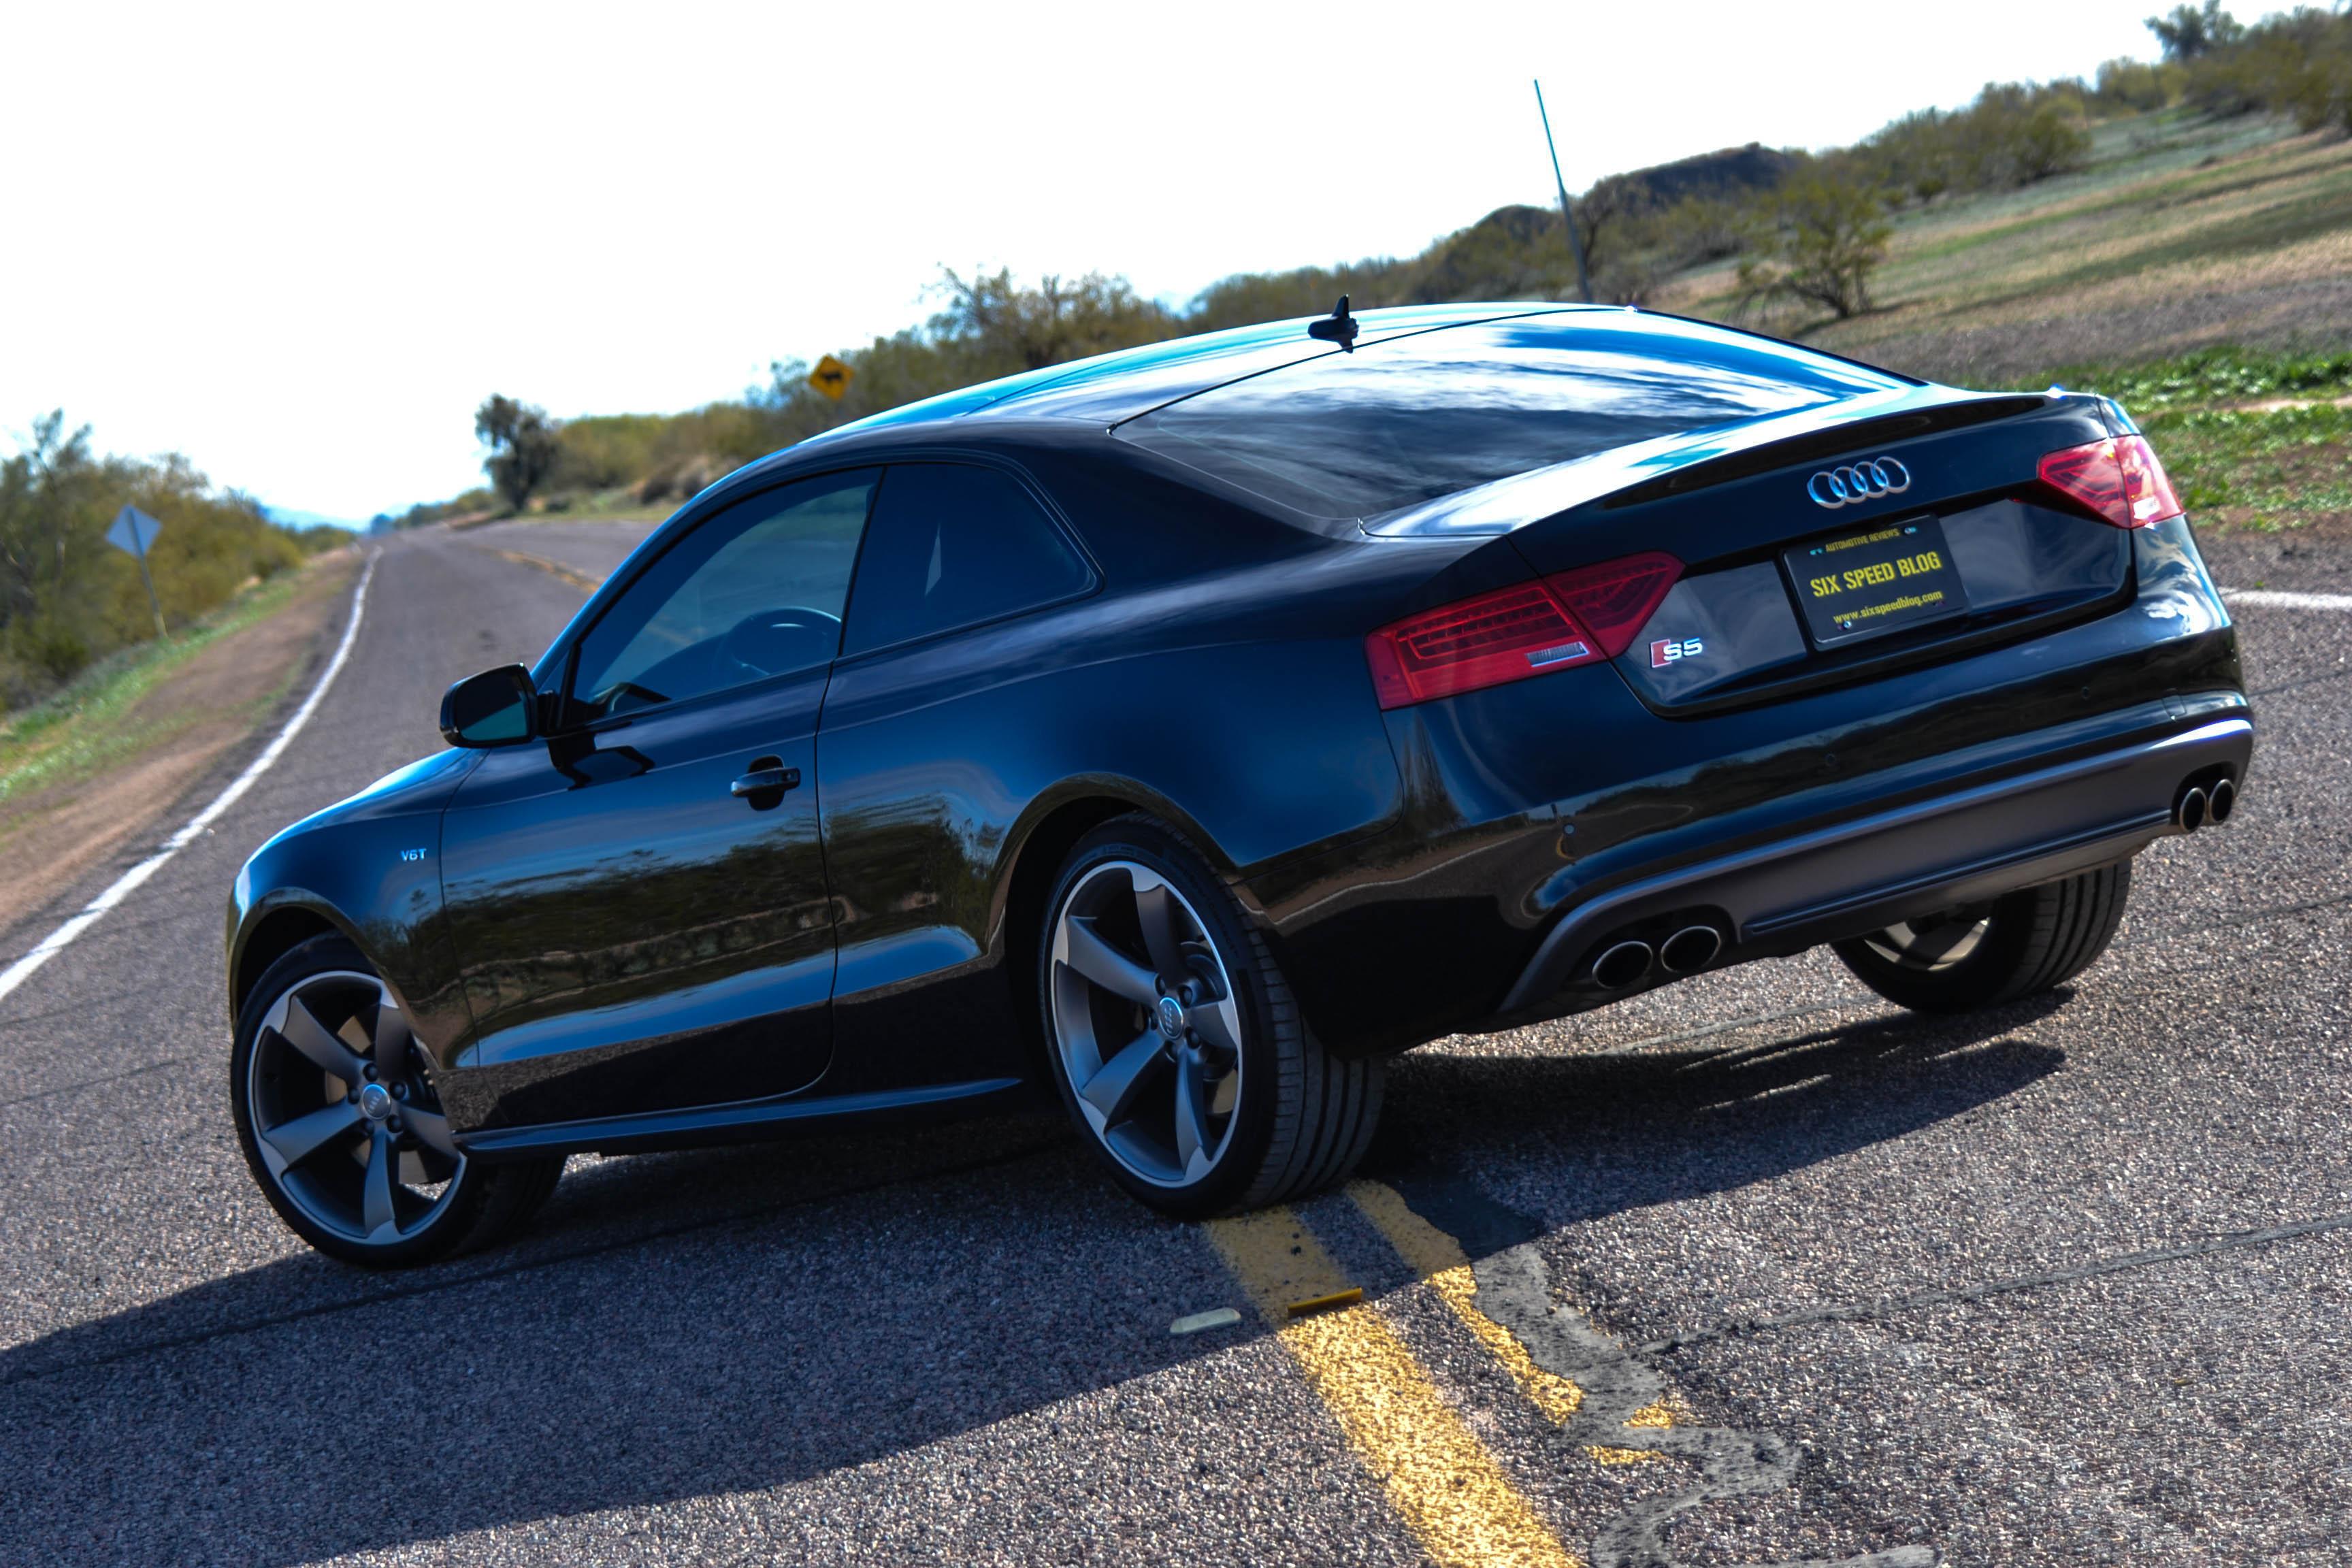 Audi Rs5 Black Optic Package 2014 Audi Rs5 Black Optic